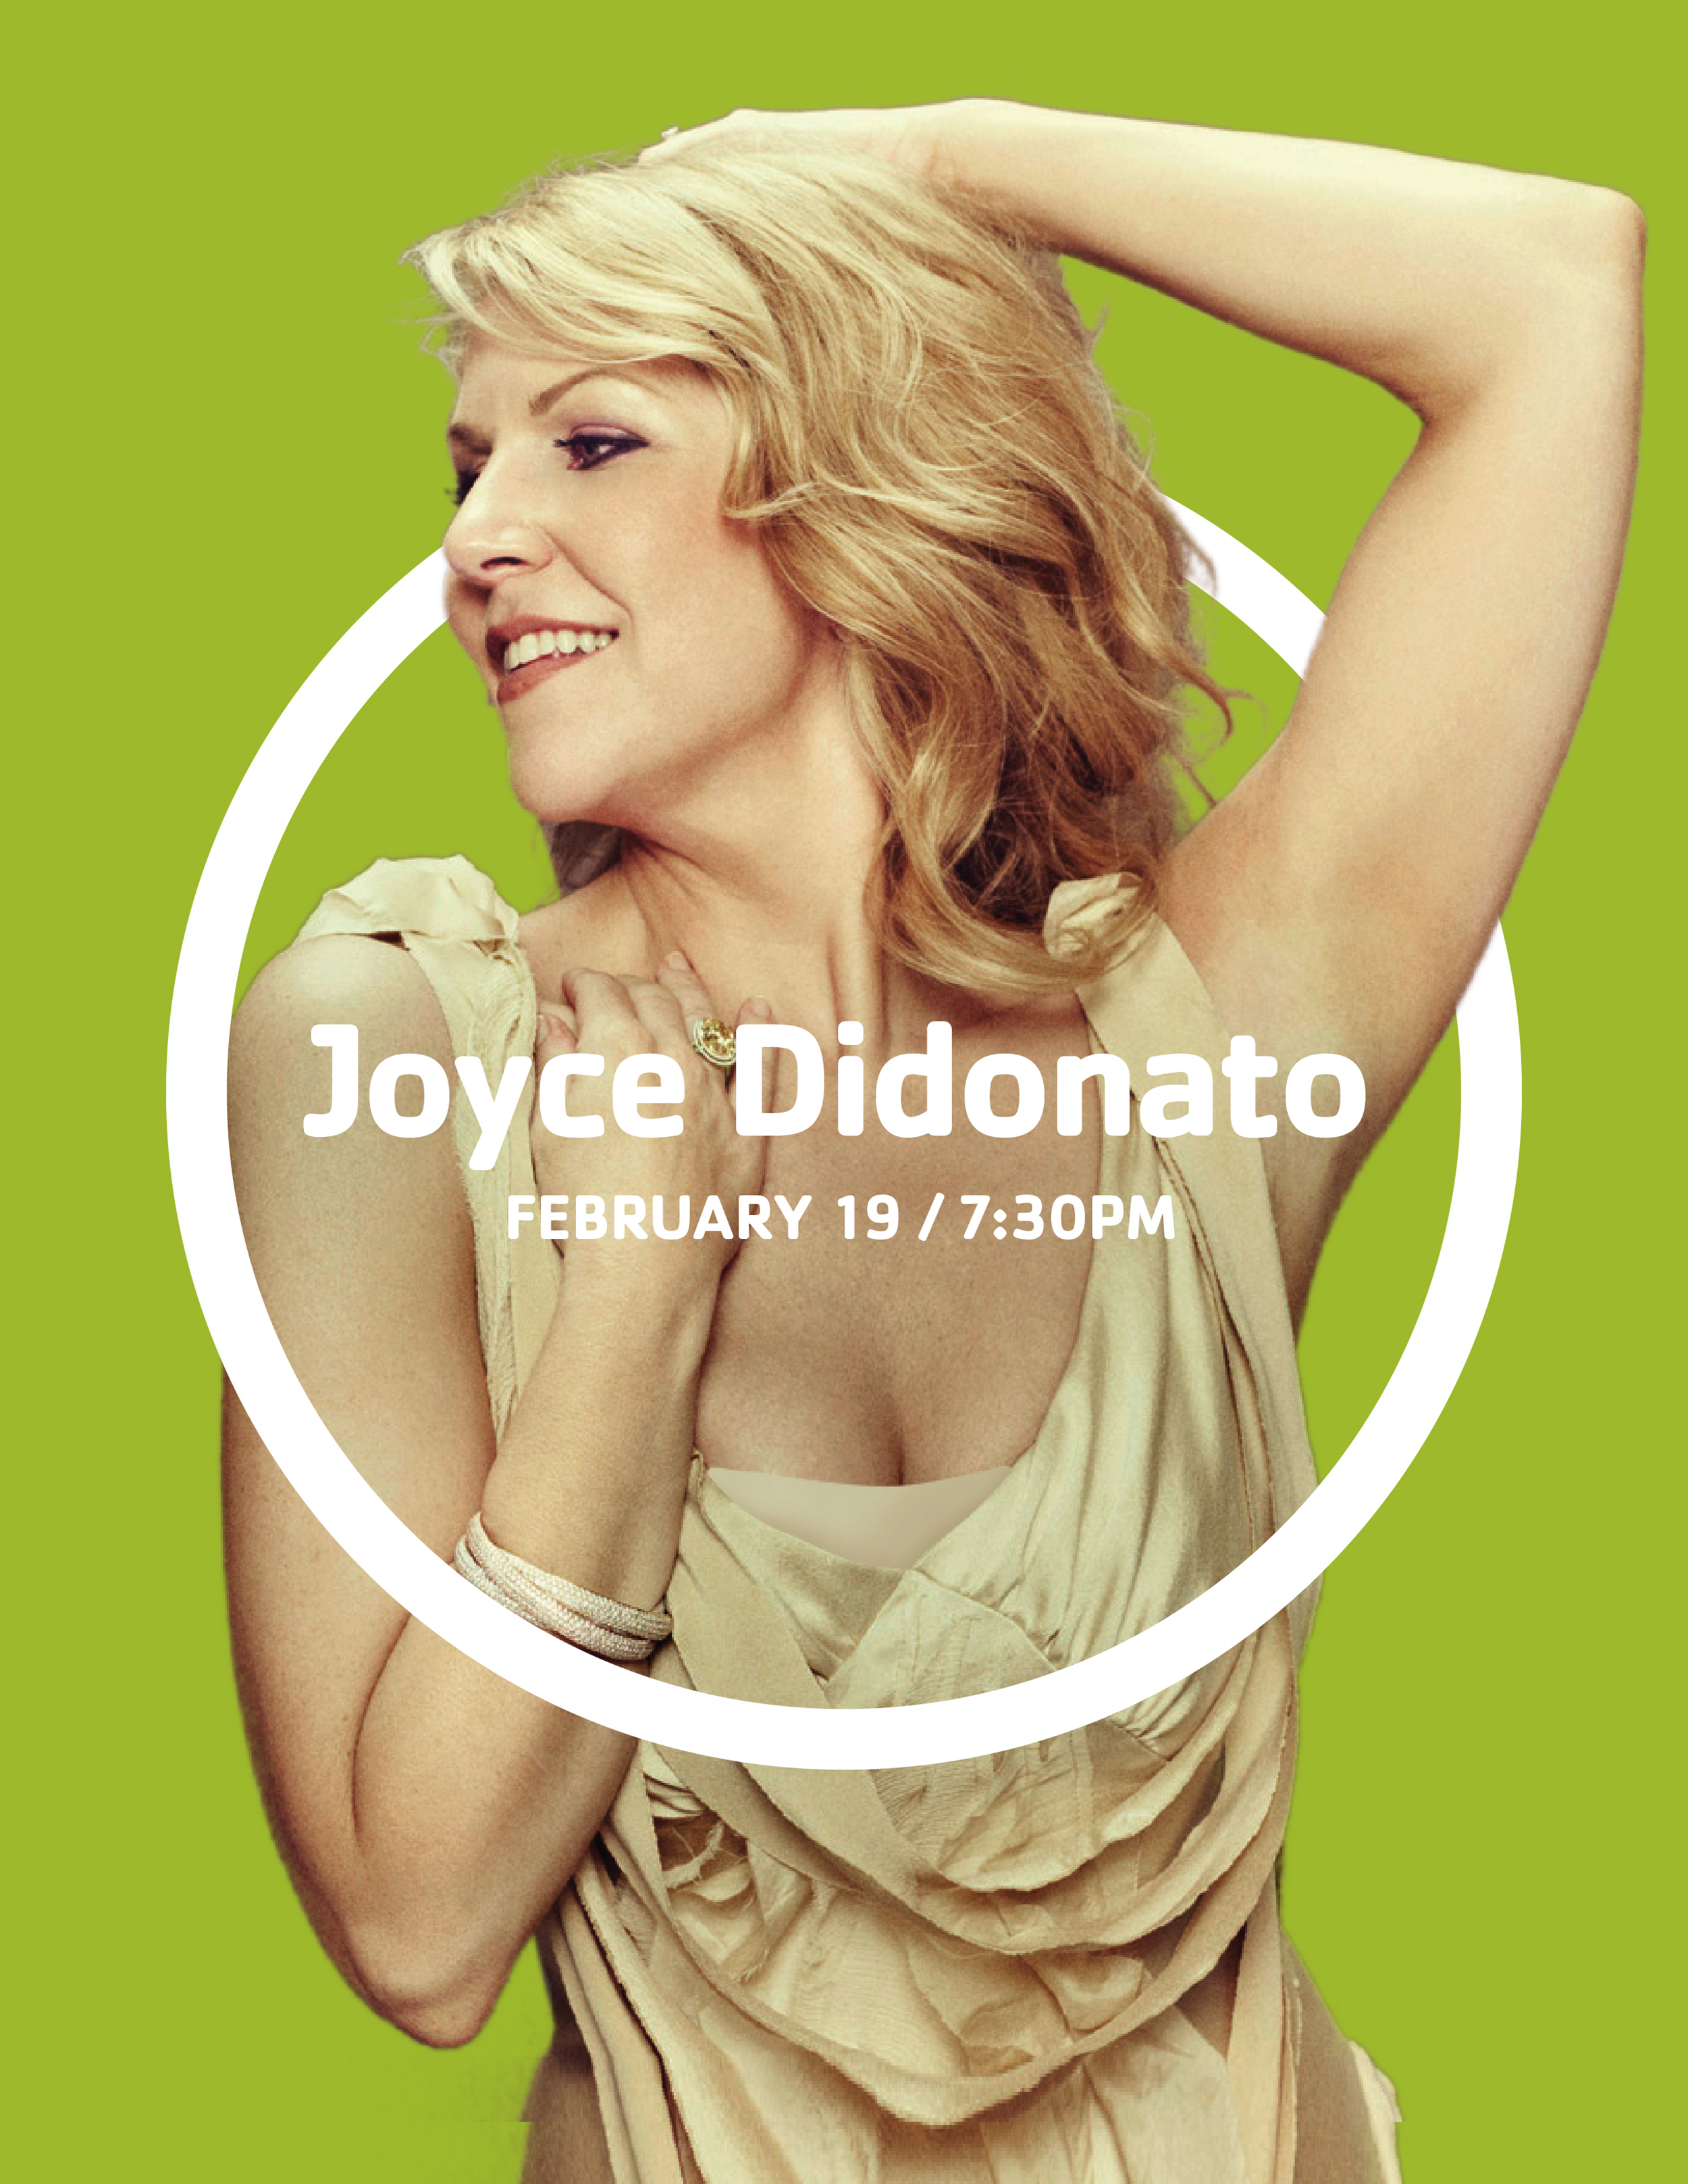 distinc_The_Broad_Stage_joyce-didonato.jpg